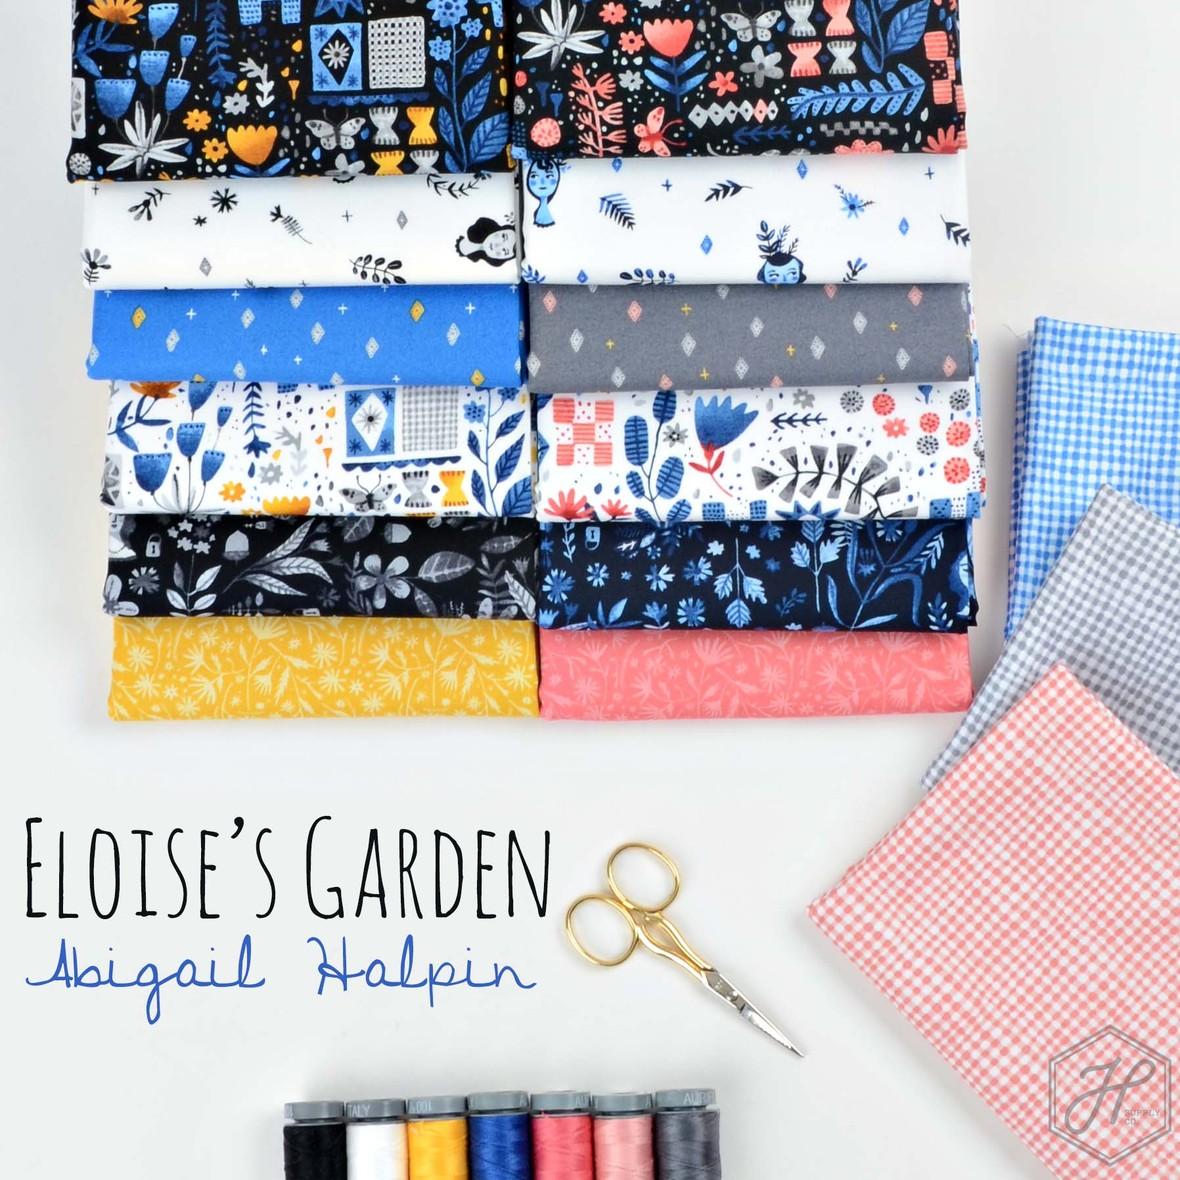 Eloises Garden Figo Fabric at Hawthorne Supply Co